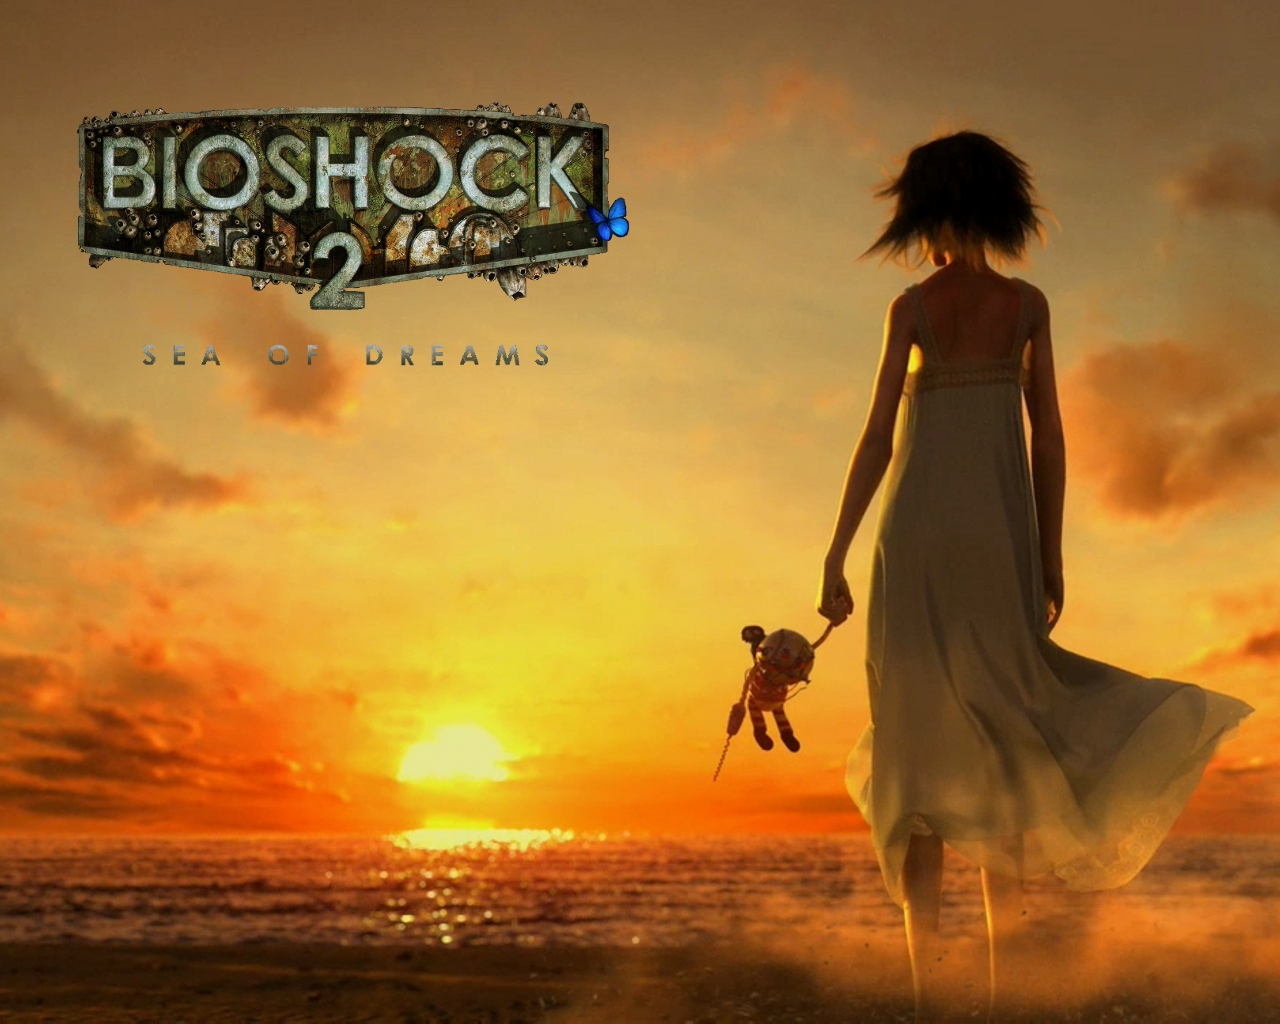 http://1.bp.blogspot.com/-sO9kHXByjNA/UBdQfH0jeBI/AAAAAAAAIsg/Cs9_BmmFm08/s1600/bioshock_2_wallpaper_by_bjnfs.jpg